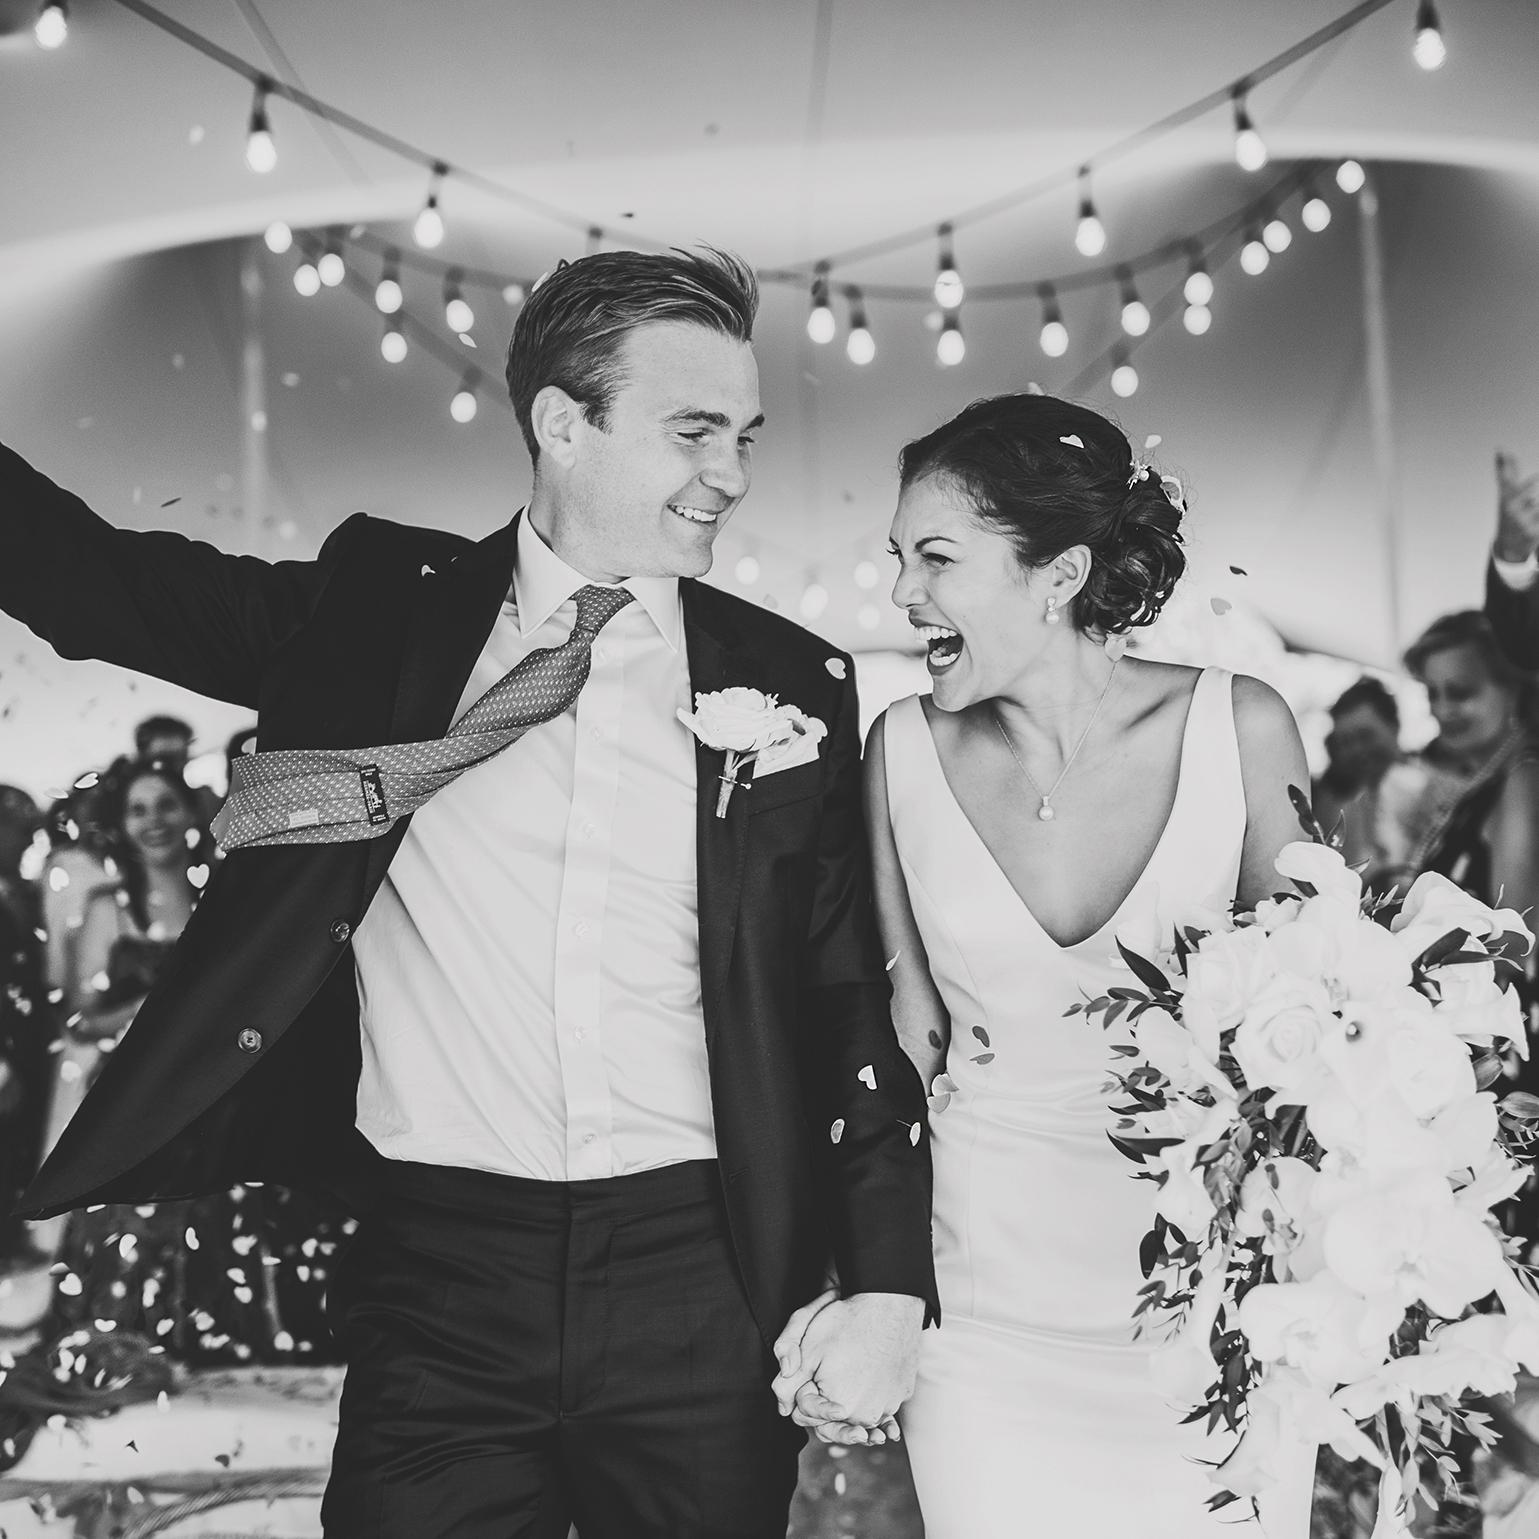 laura_and_charles_august_11_2018_rachel_manns_334_b_edit_essex_wedding_photographer_square.jpg